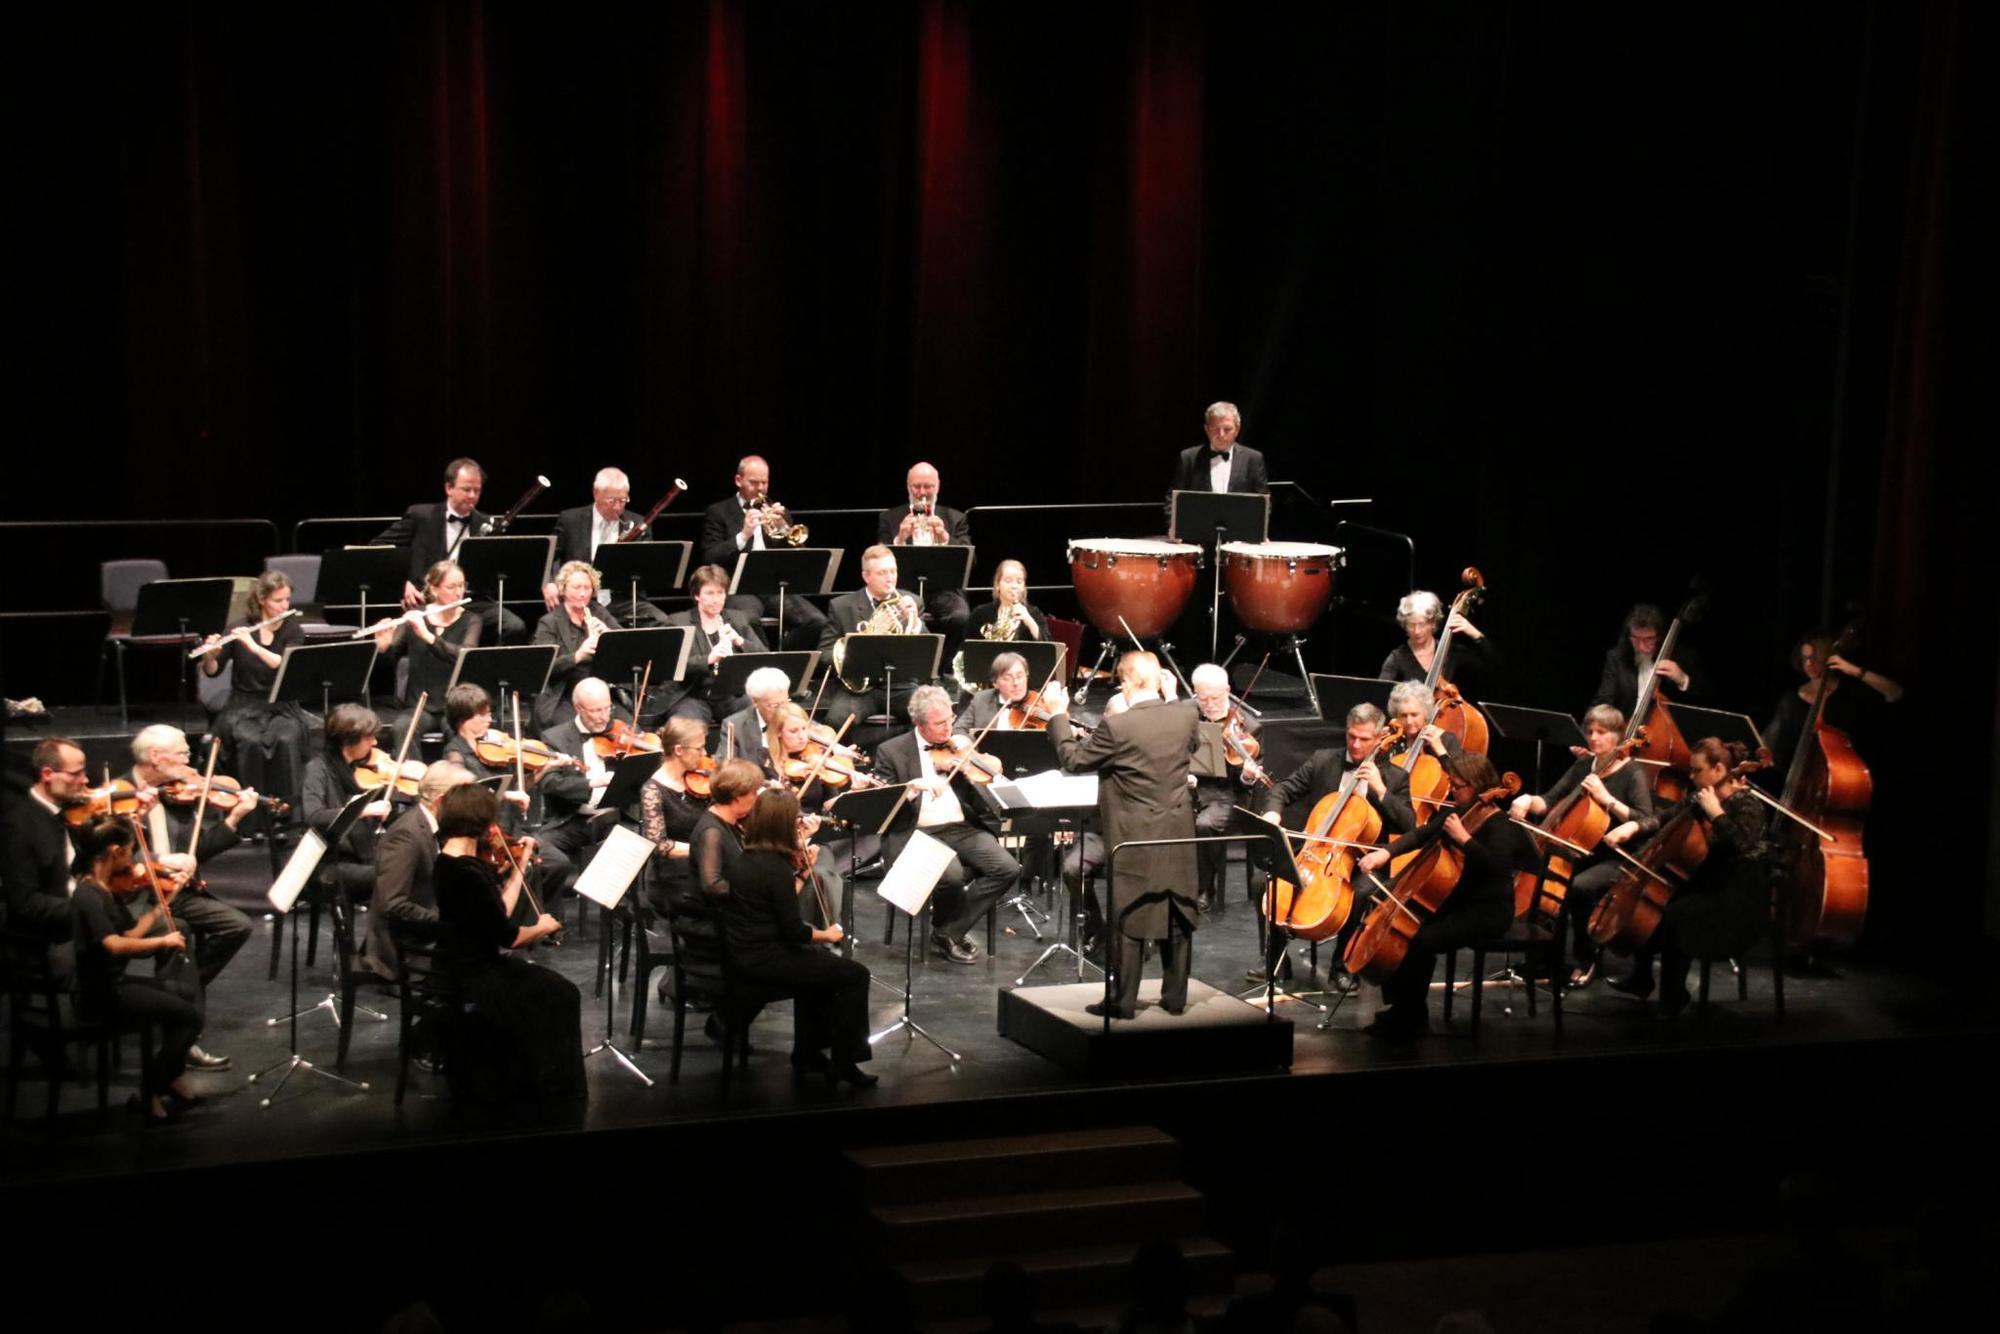 Fröhlicher Frühjahrsgruß klassischer Musik